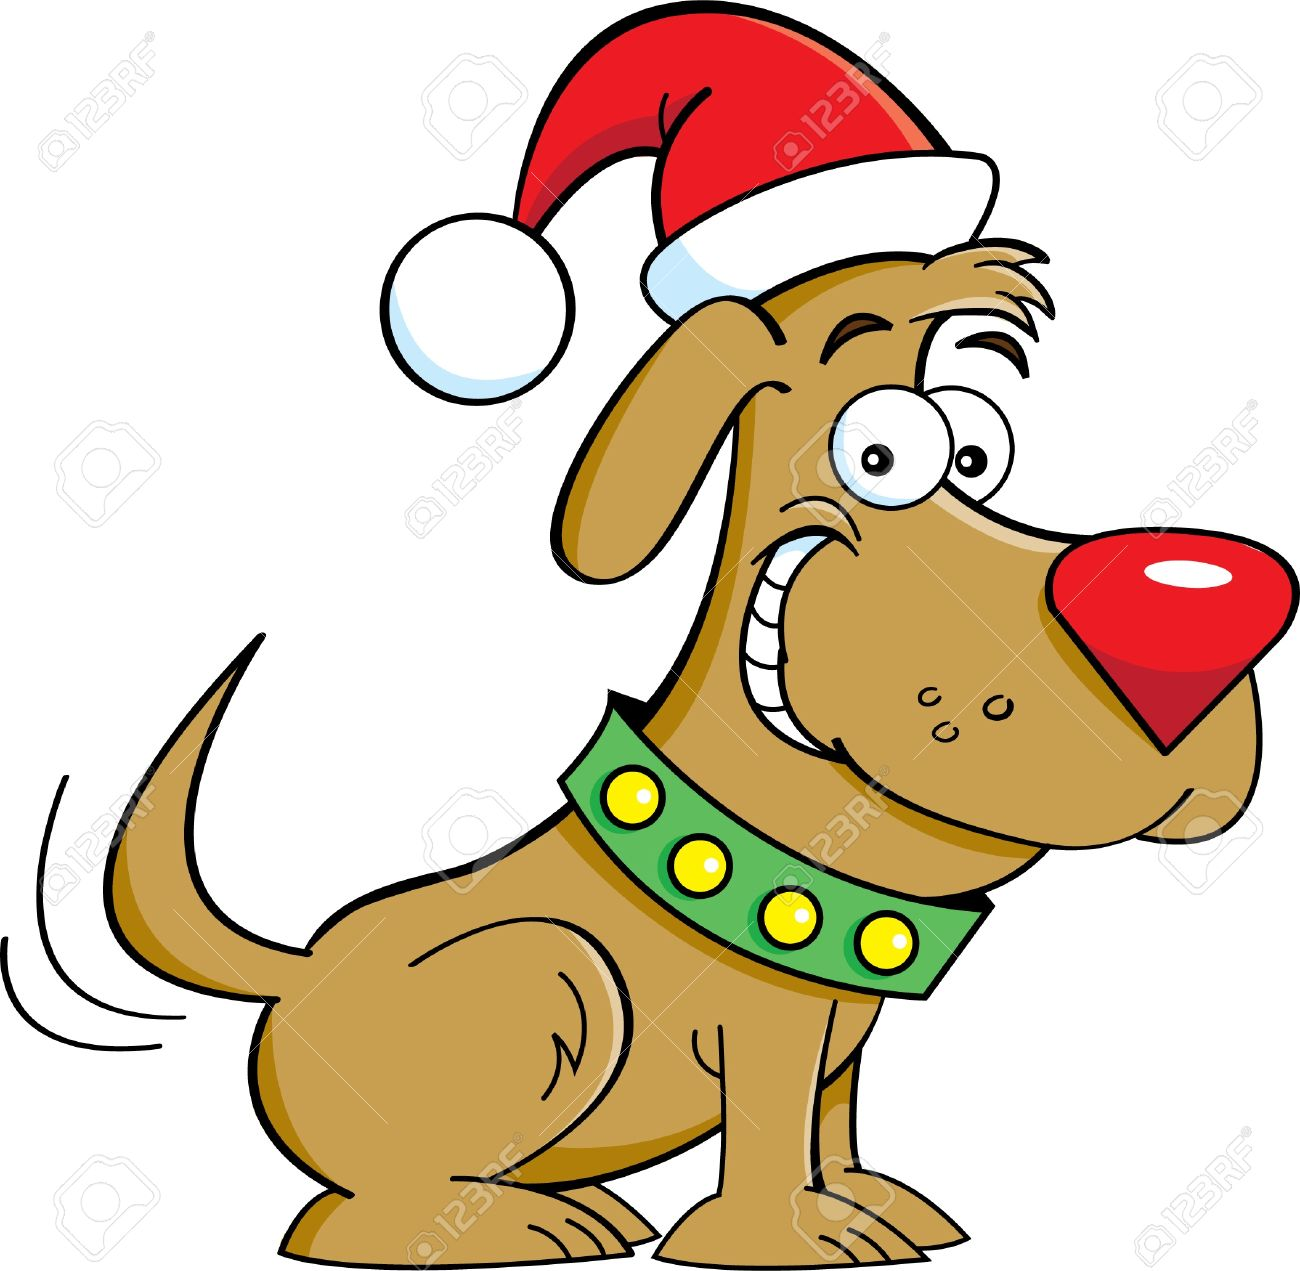 Cartoon illustration of a dog wearing a Santa hat Stock Vector - 15259443